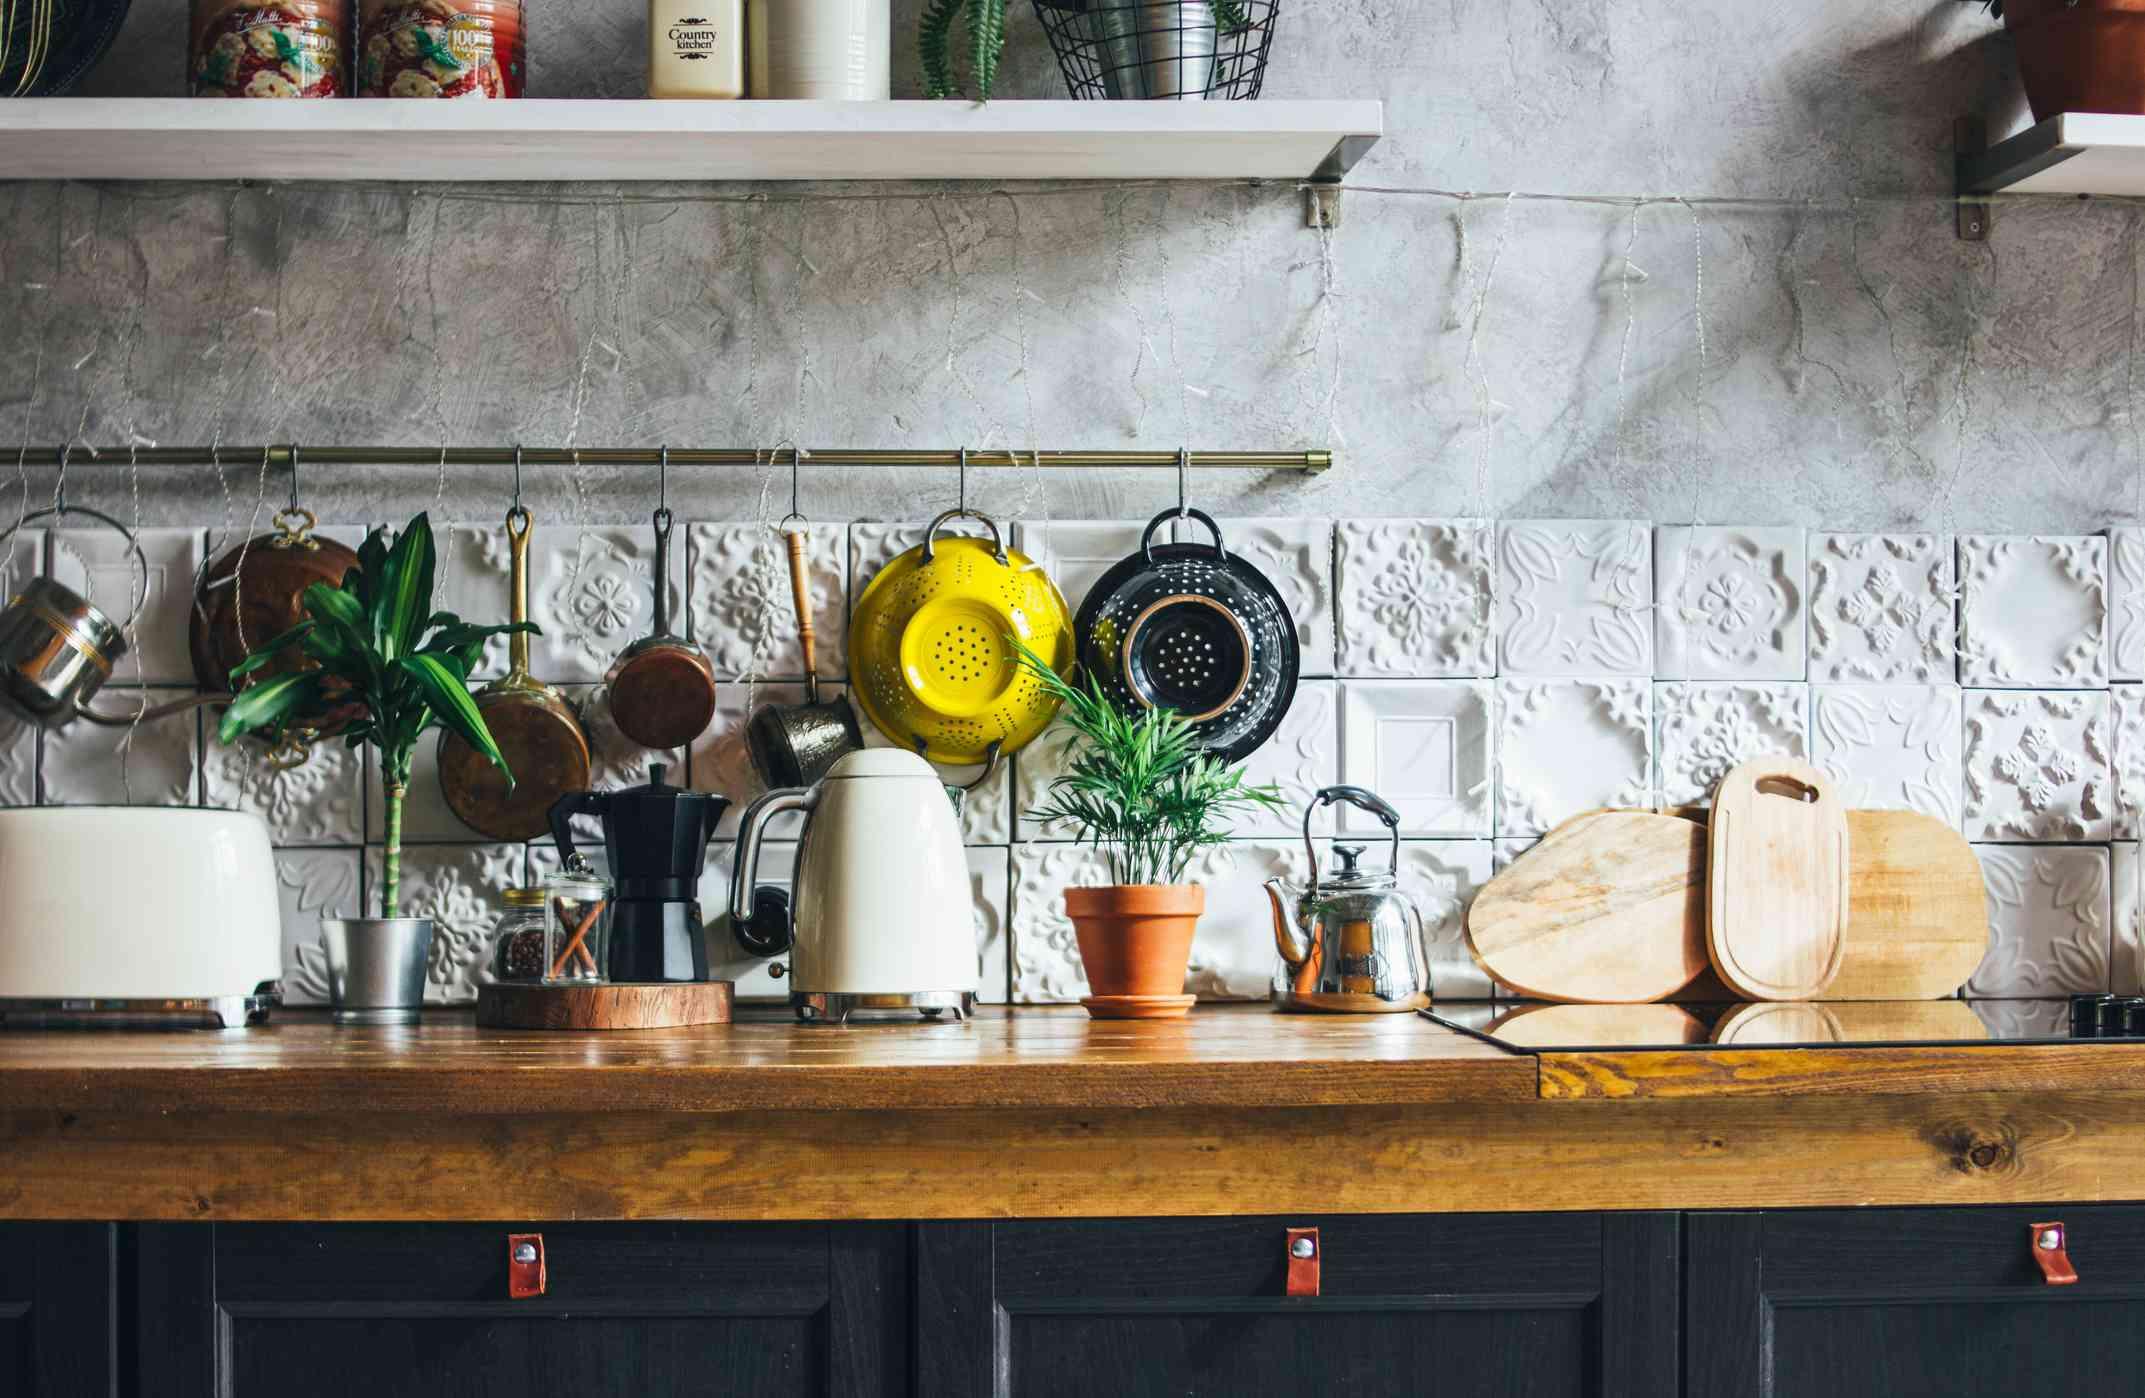 Textured tile kitchen backsplash